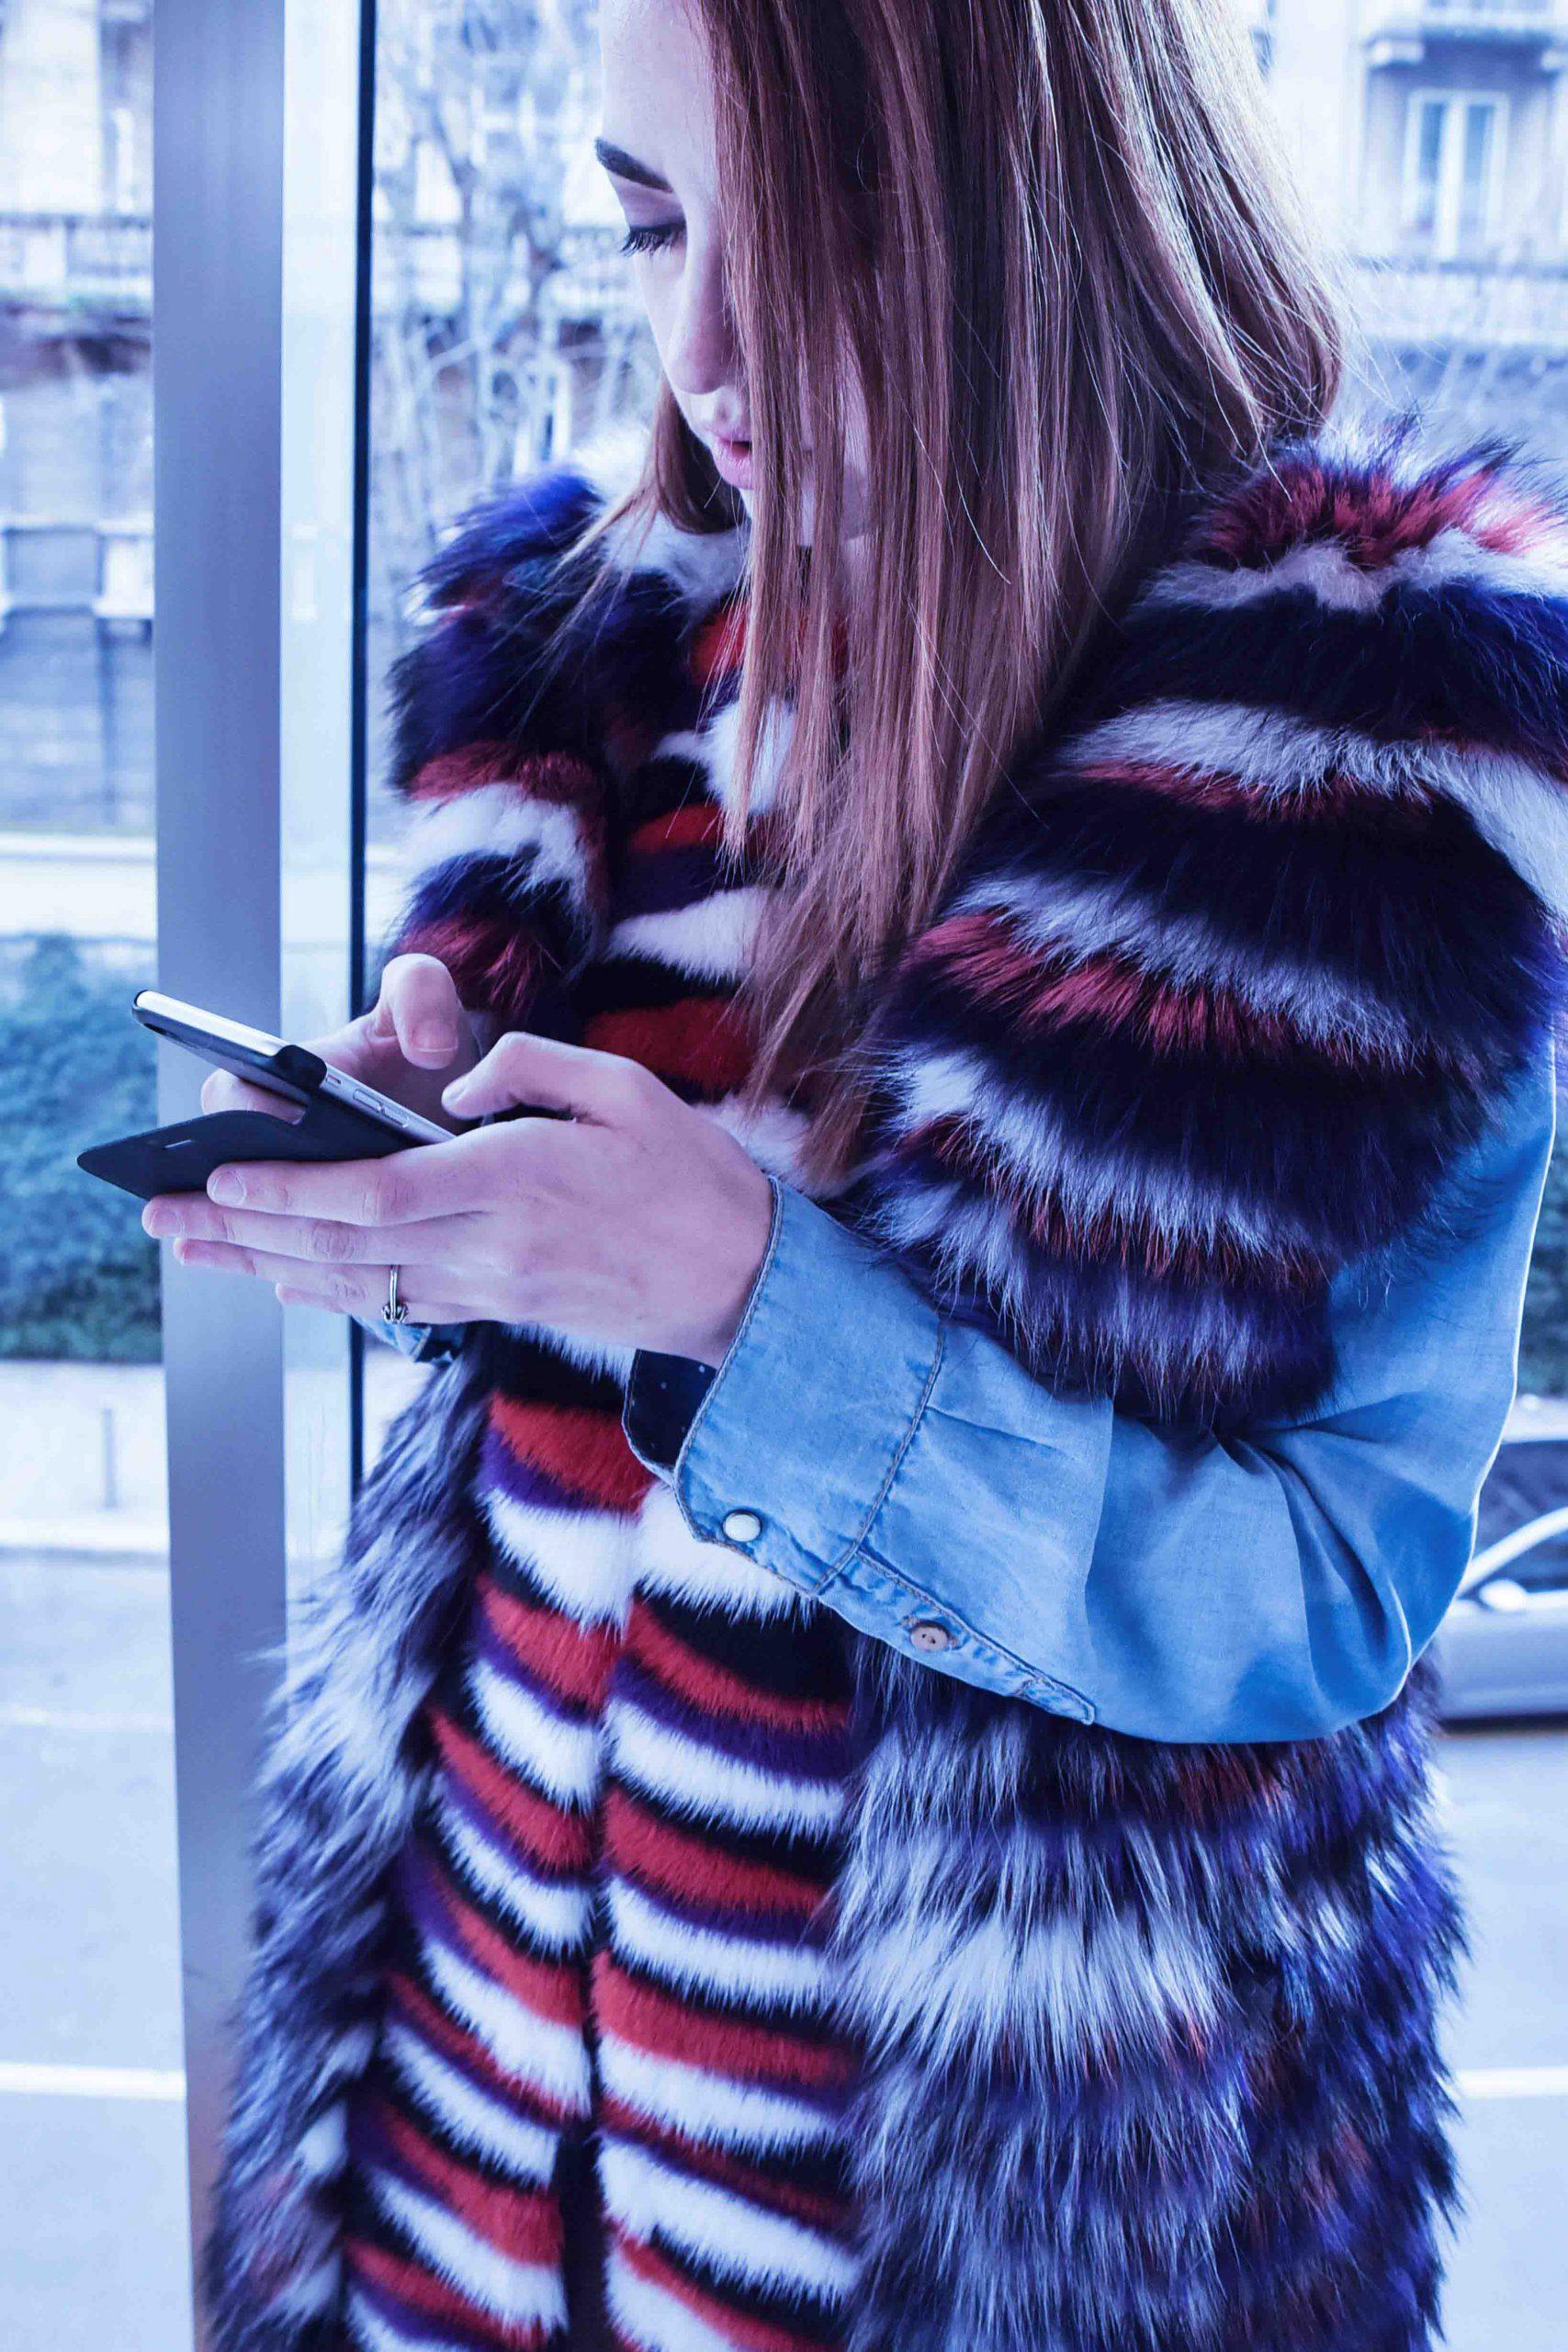 new york fashion week 2015 pelliccia di visone vladimiro gioia